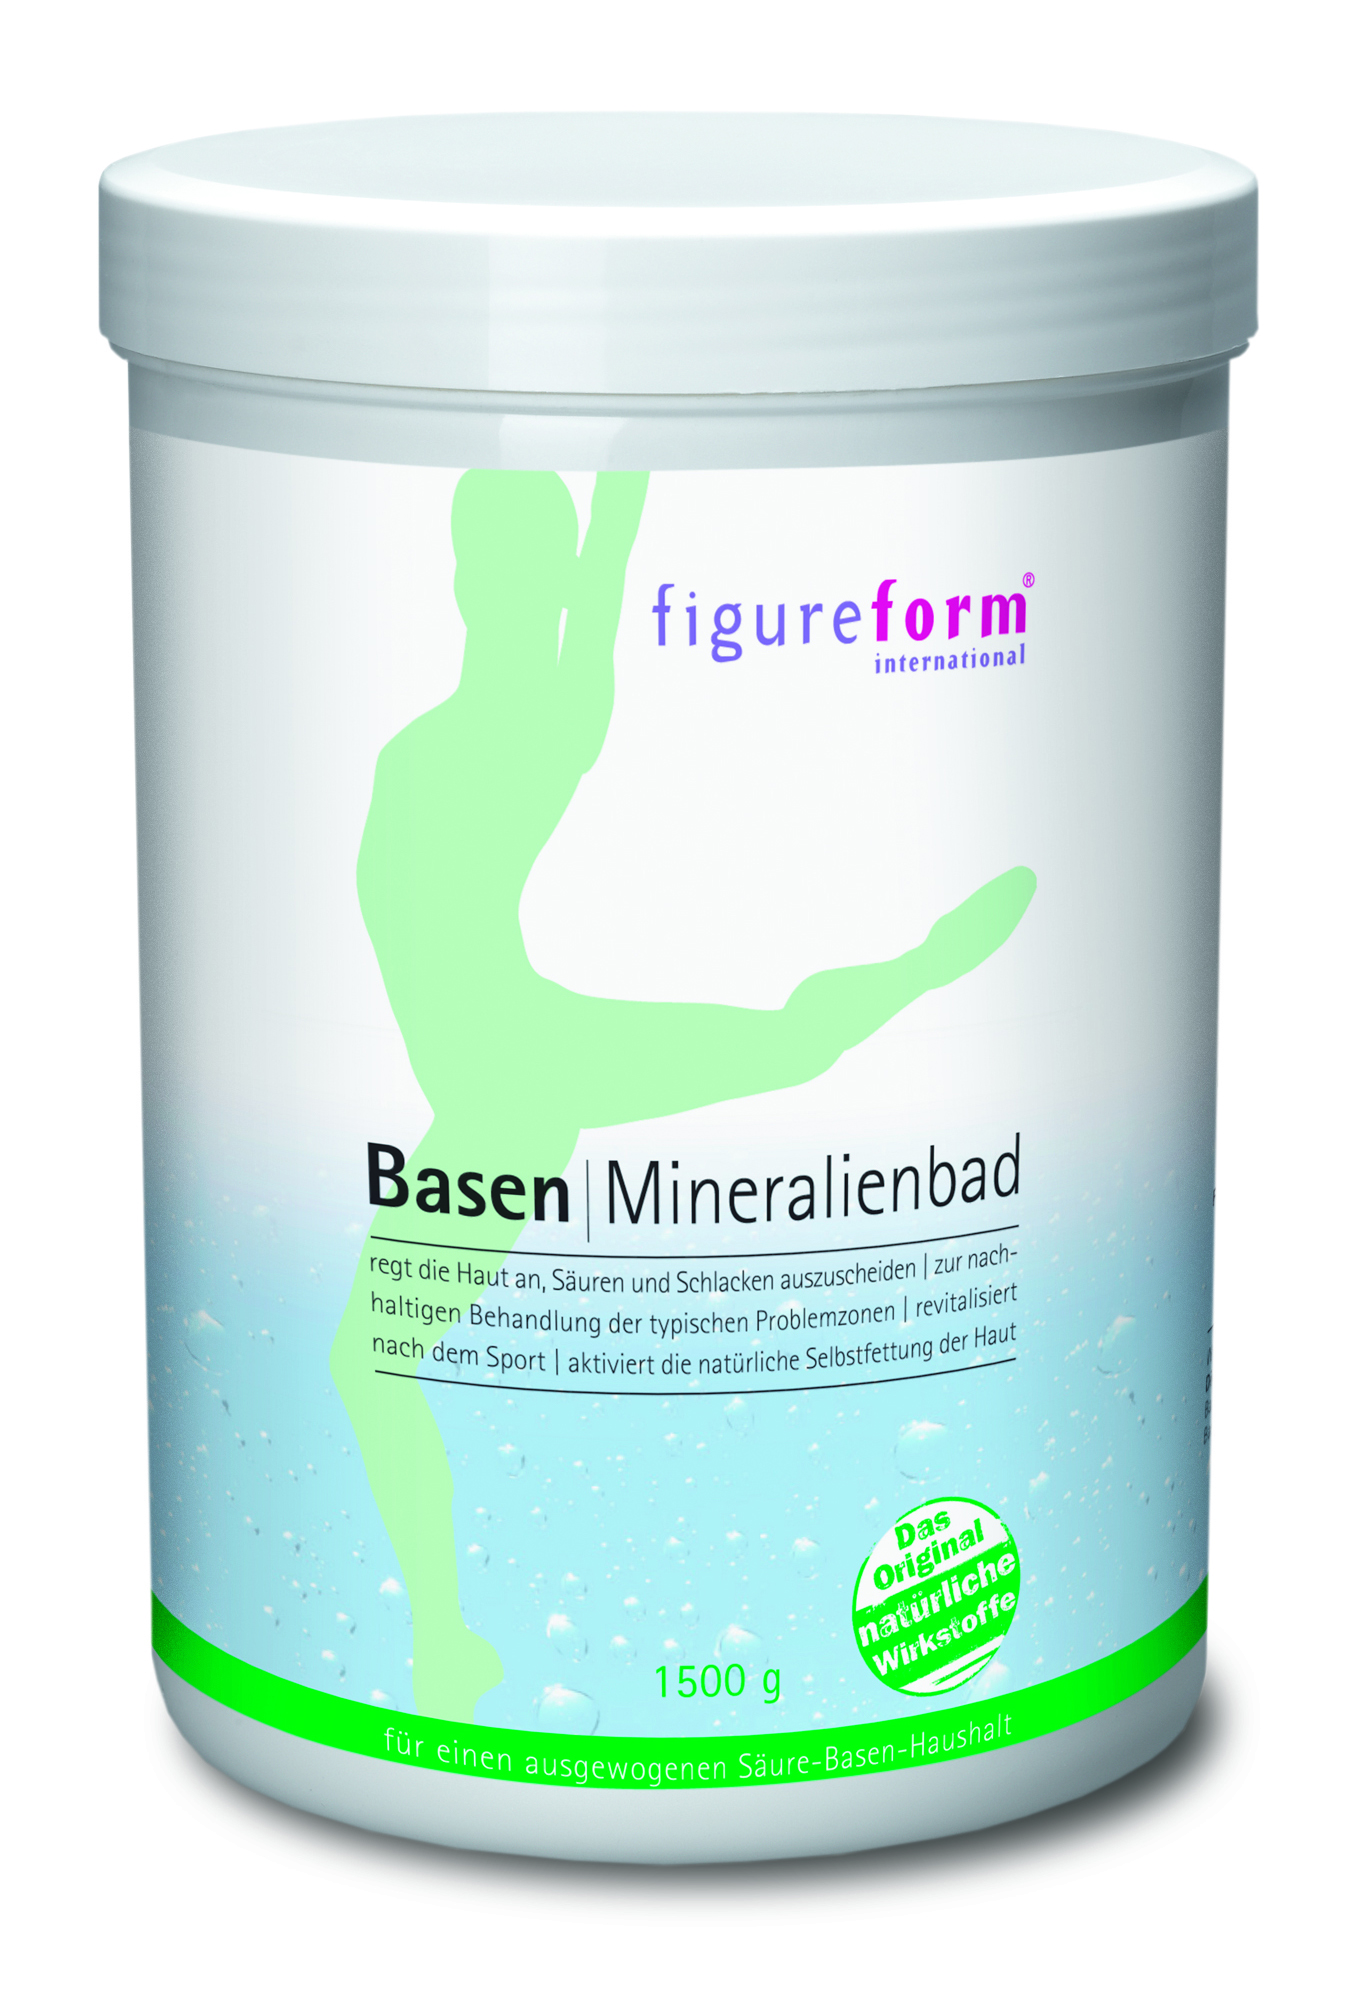 Figureform Basen-Mineralienbad